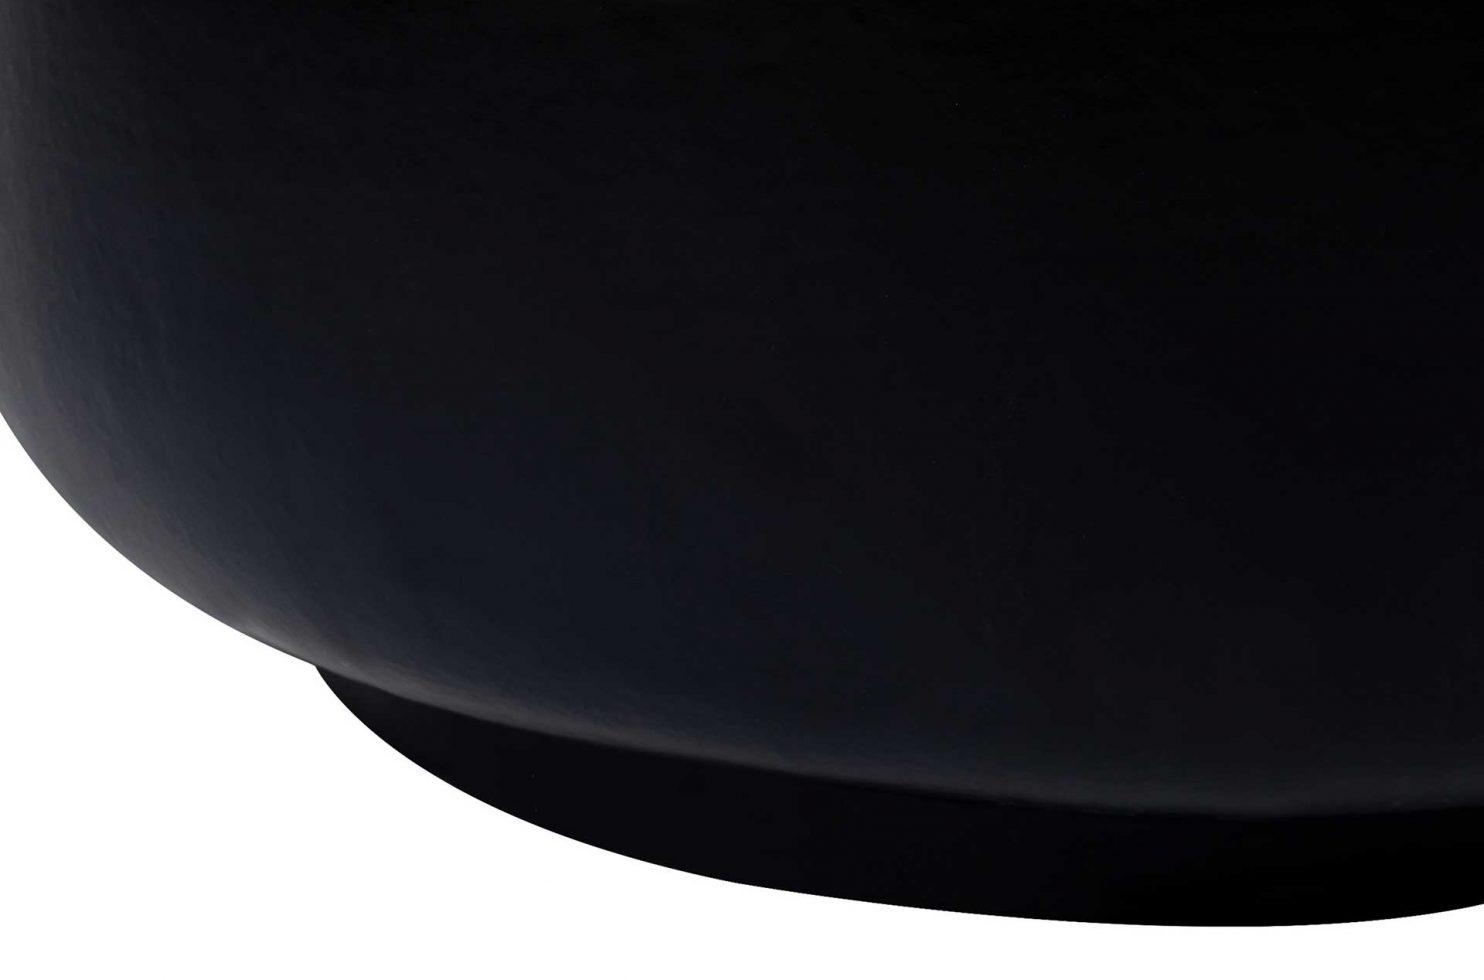 prov cer serenity side table 20in C3080152132 jet coal dtl2 web